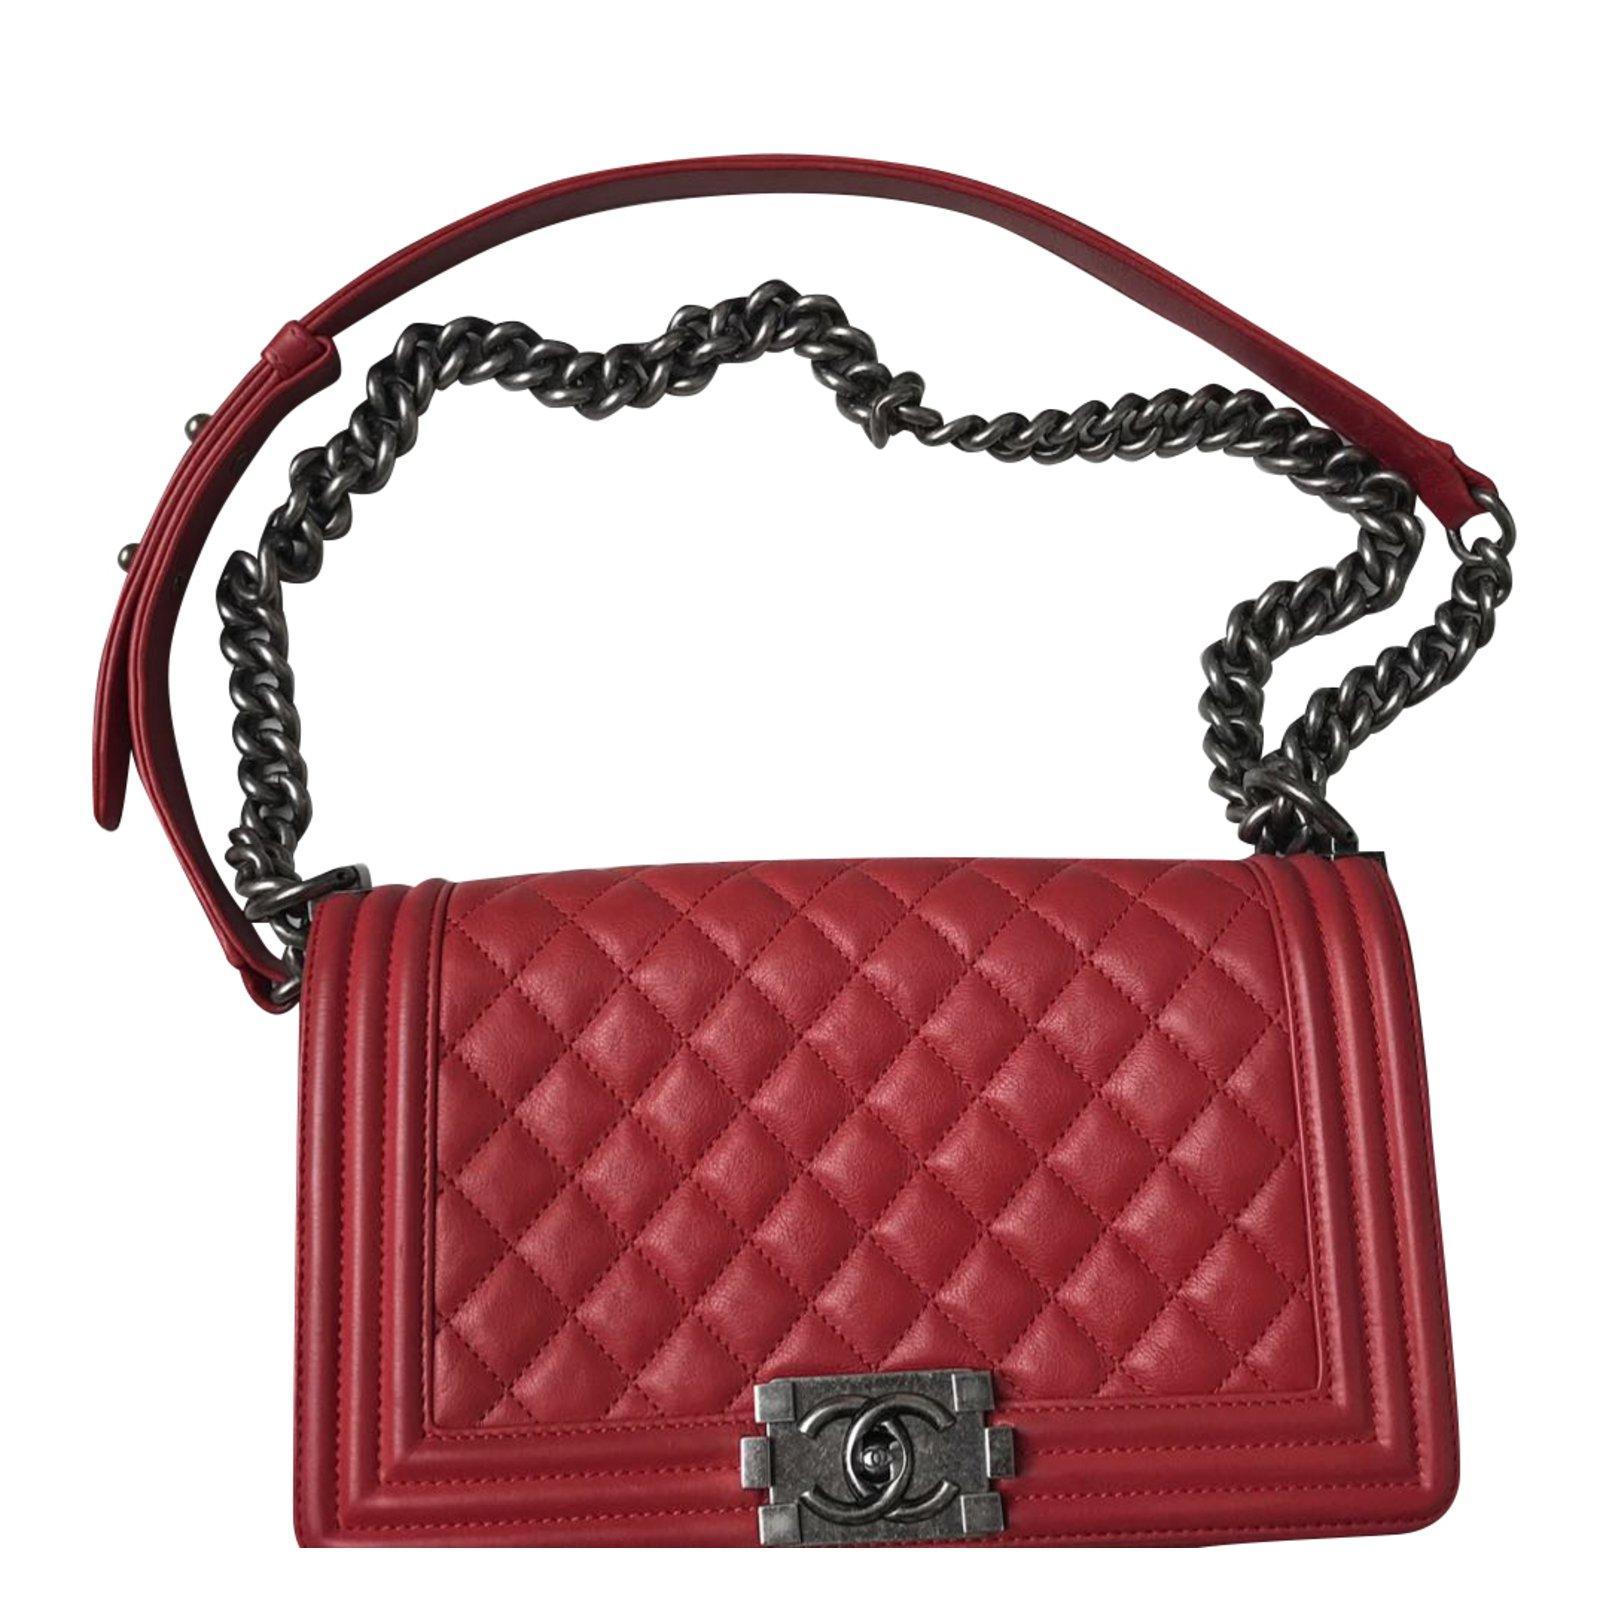 67a4b38b2178d2 Chanel Boy medium Handbags Leather Red ref.43511 - Joli Closet